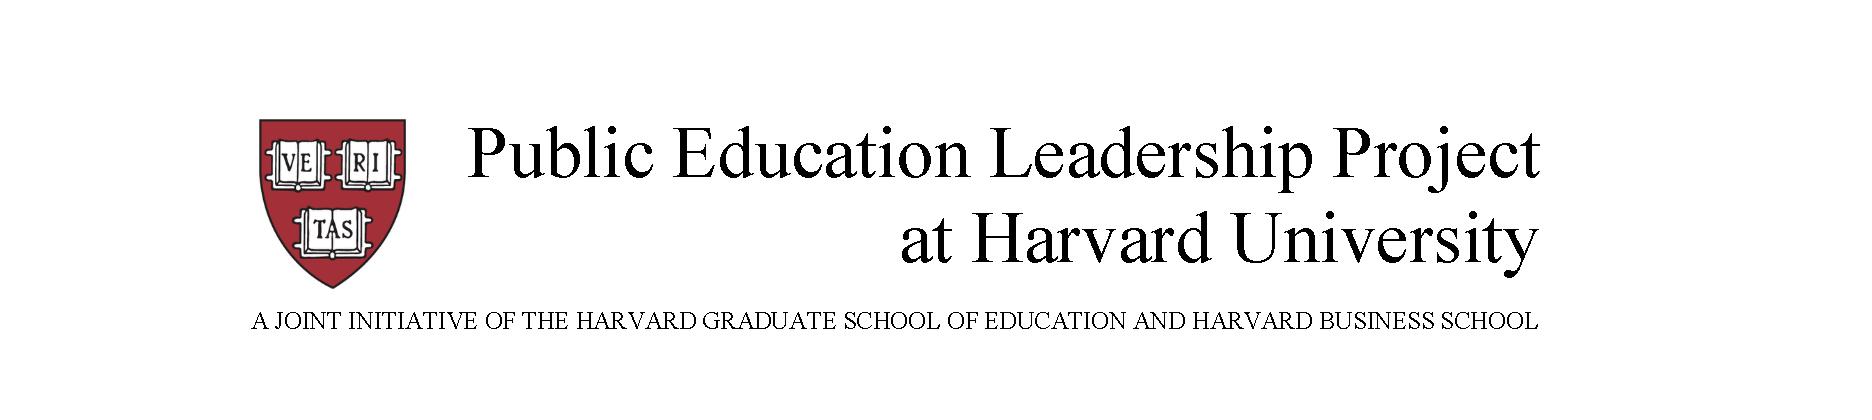 Public Education Leadership Project